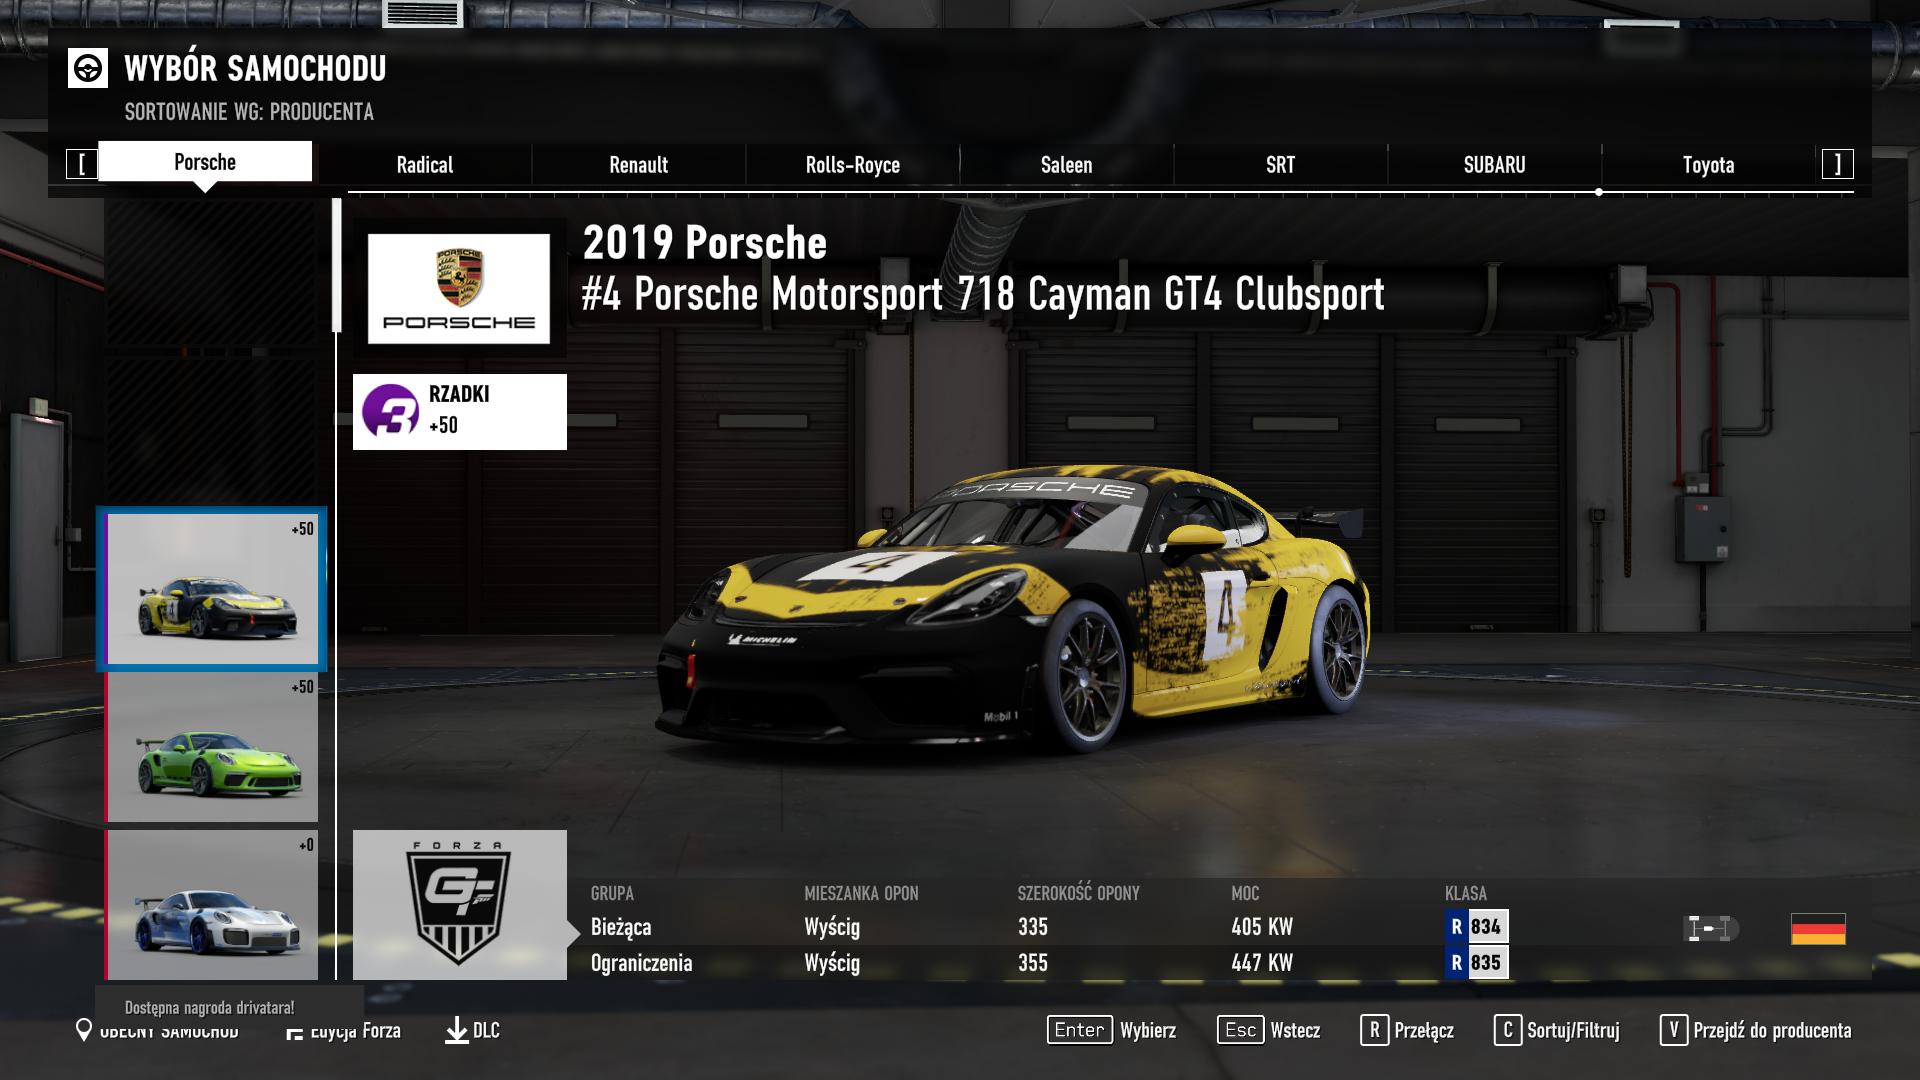 Forza Motorsport 7 - Porsche Motorsport 718 Cayman GT4 Clubsport - auto za darmo!